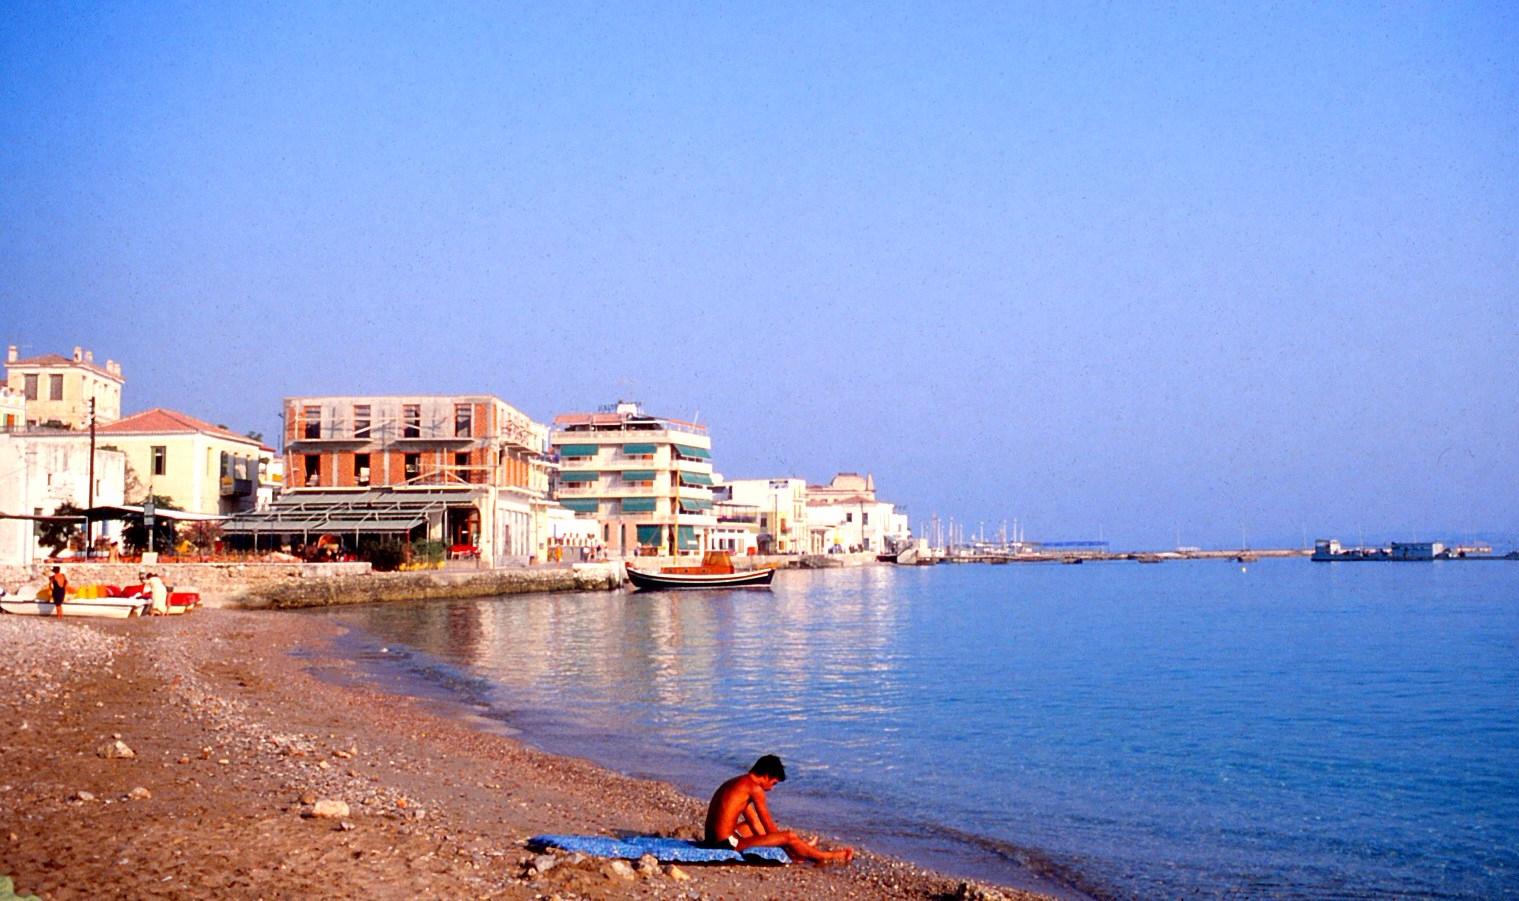 Grekland 79. 50 b. Spetses